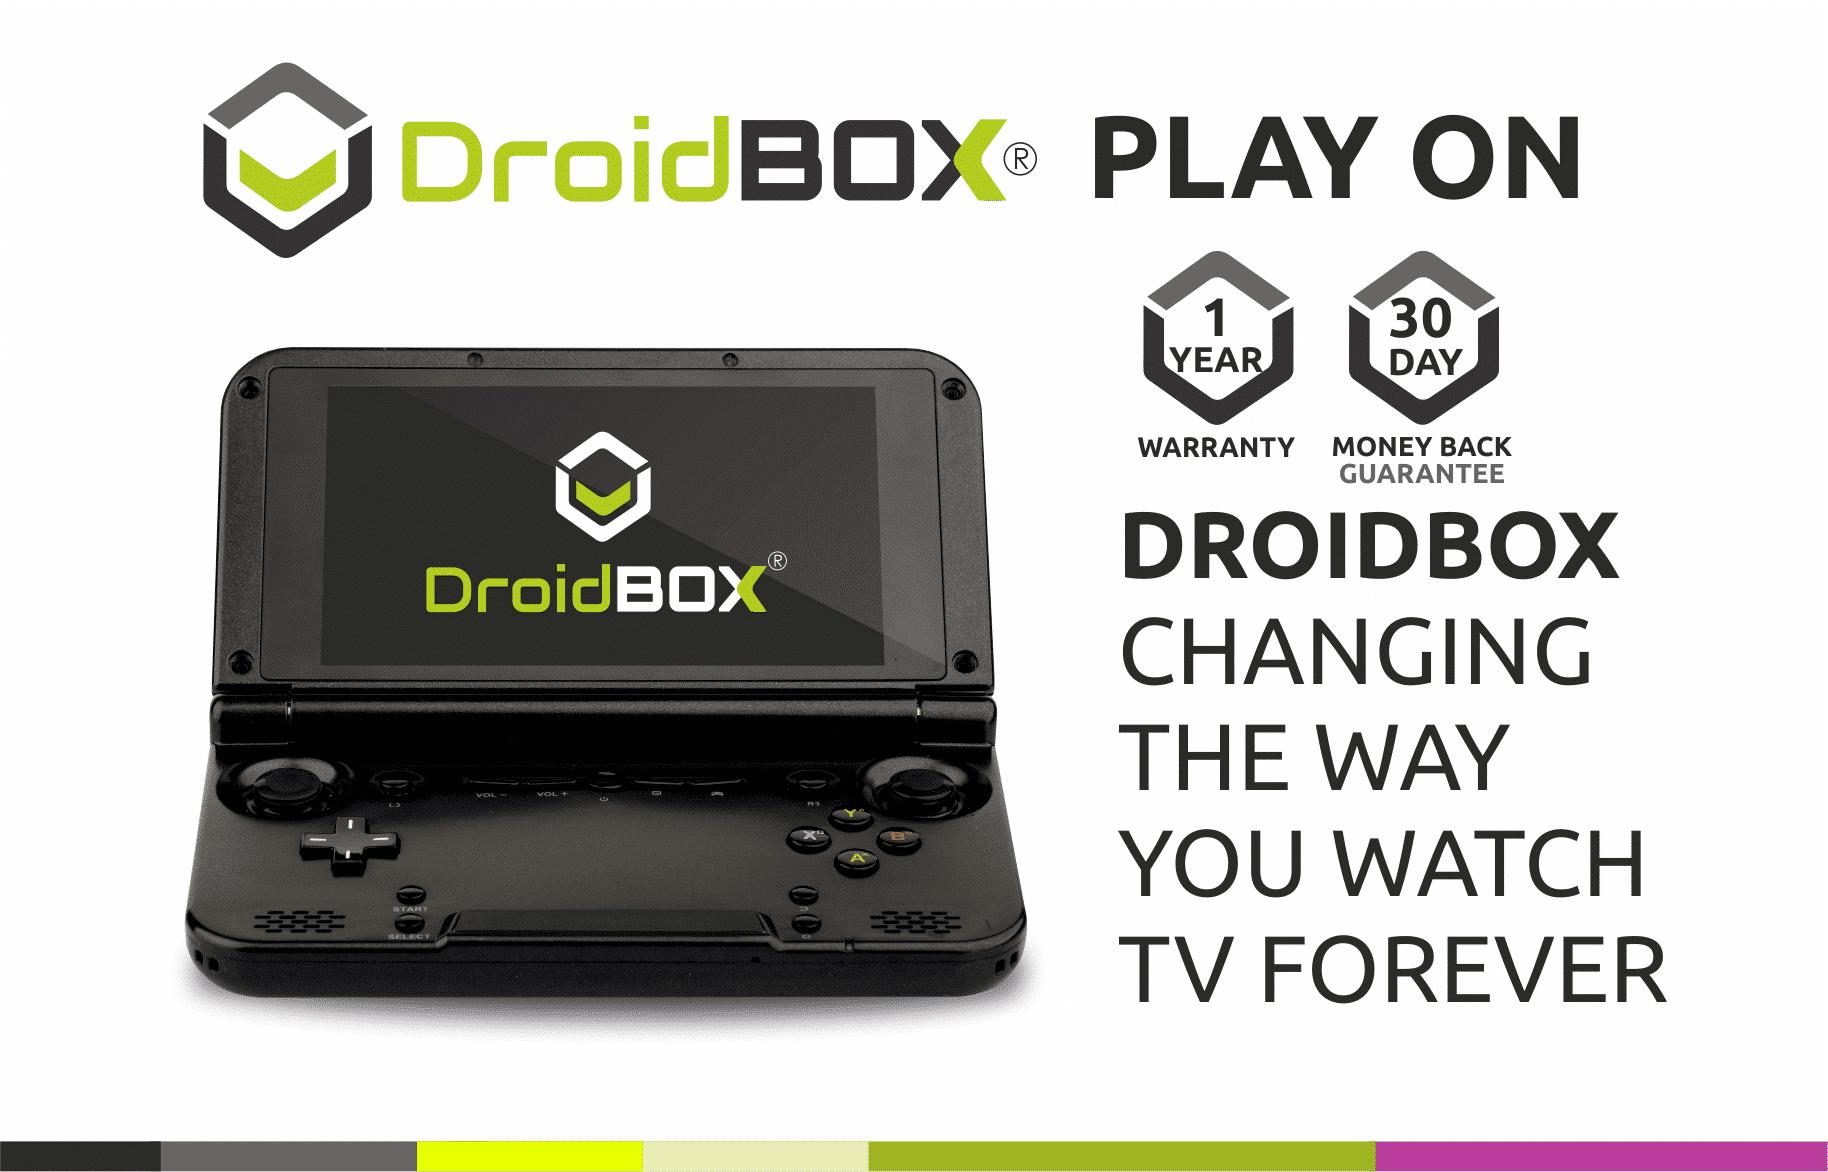 DroidBOX GPD XD PlayOn 1 Year Warranty